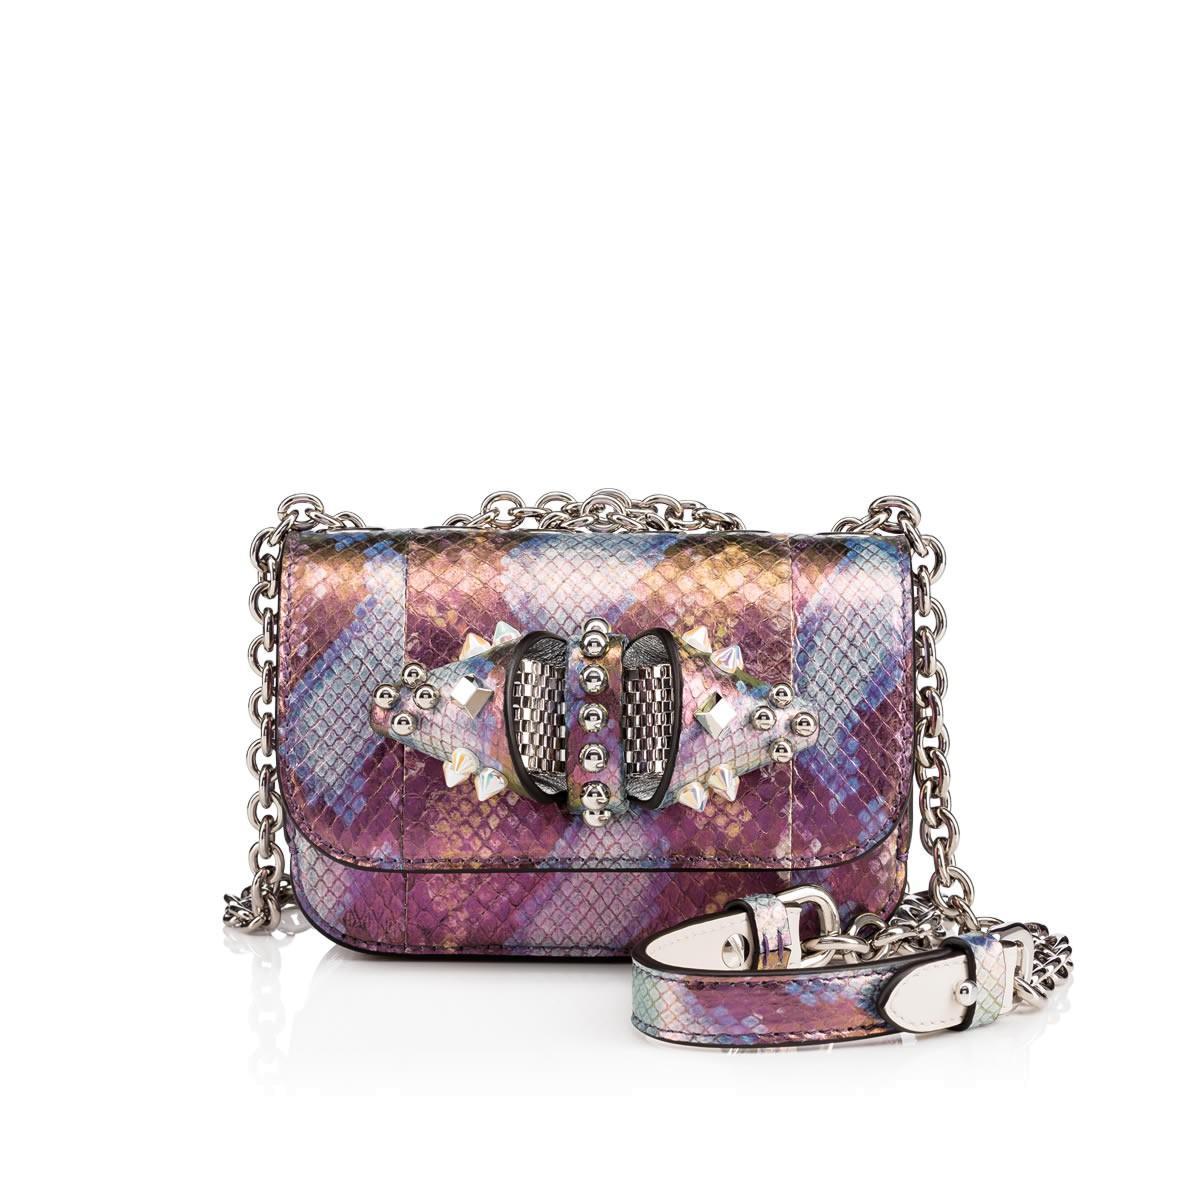 3e64aca37fe Christian Louboutin Sweety Charity Mini Chain Bag Multicolor Snakeskin -  Handbags -